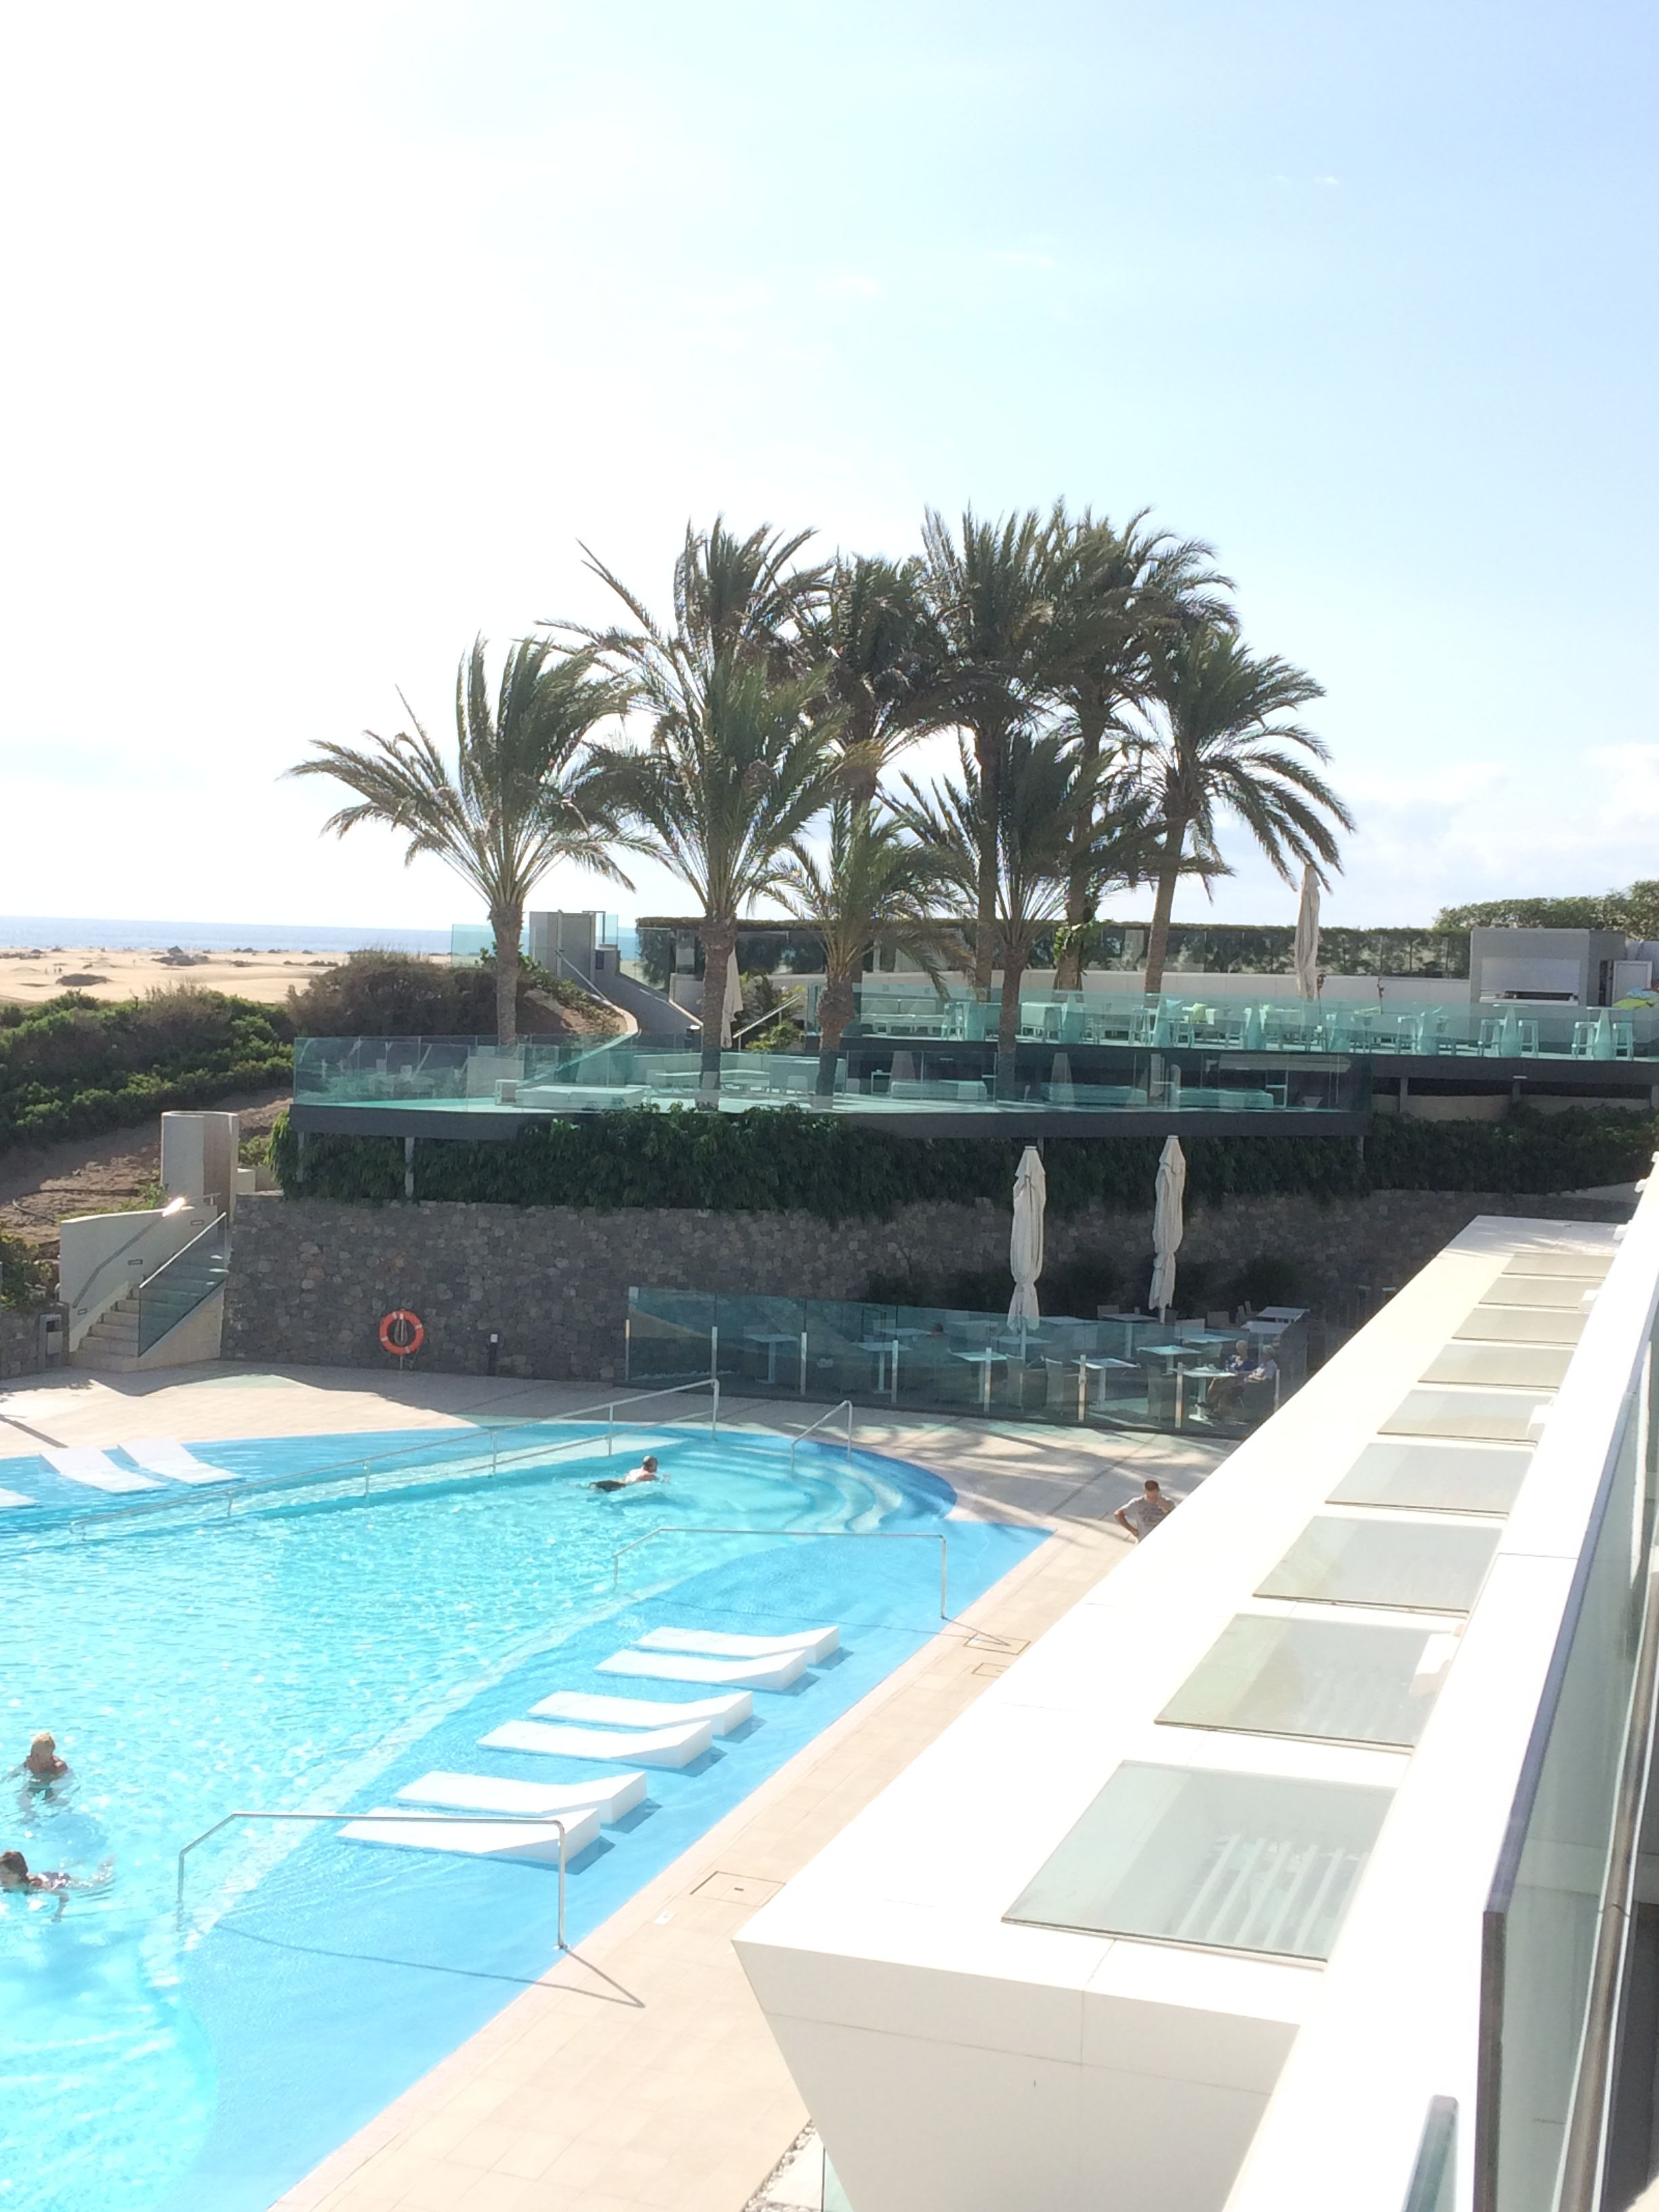 Santa Monica Suites Hotel, Playa del Ingles